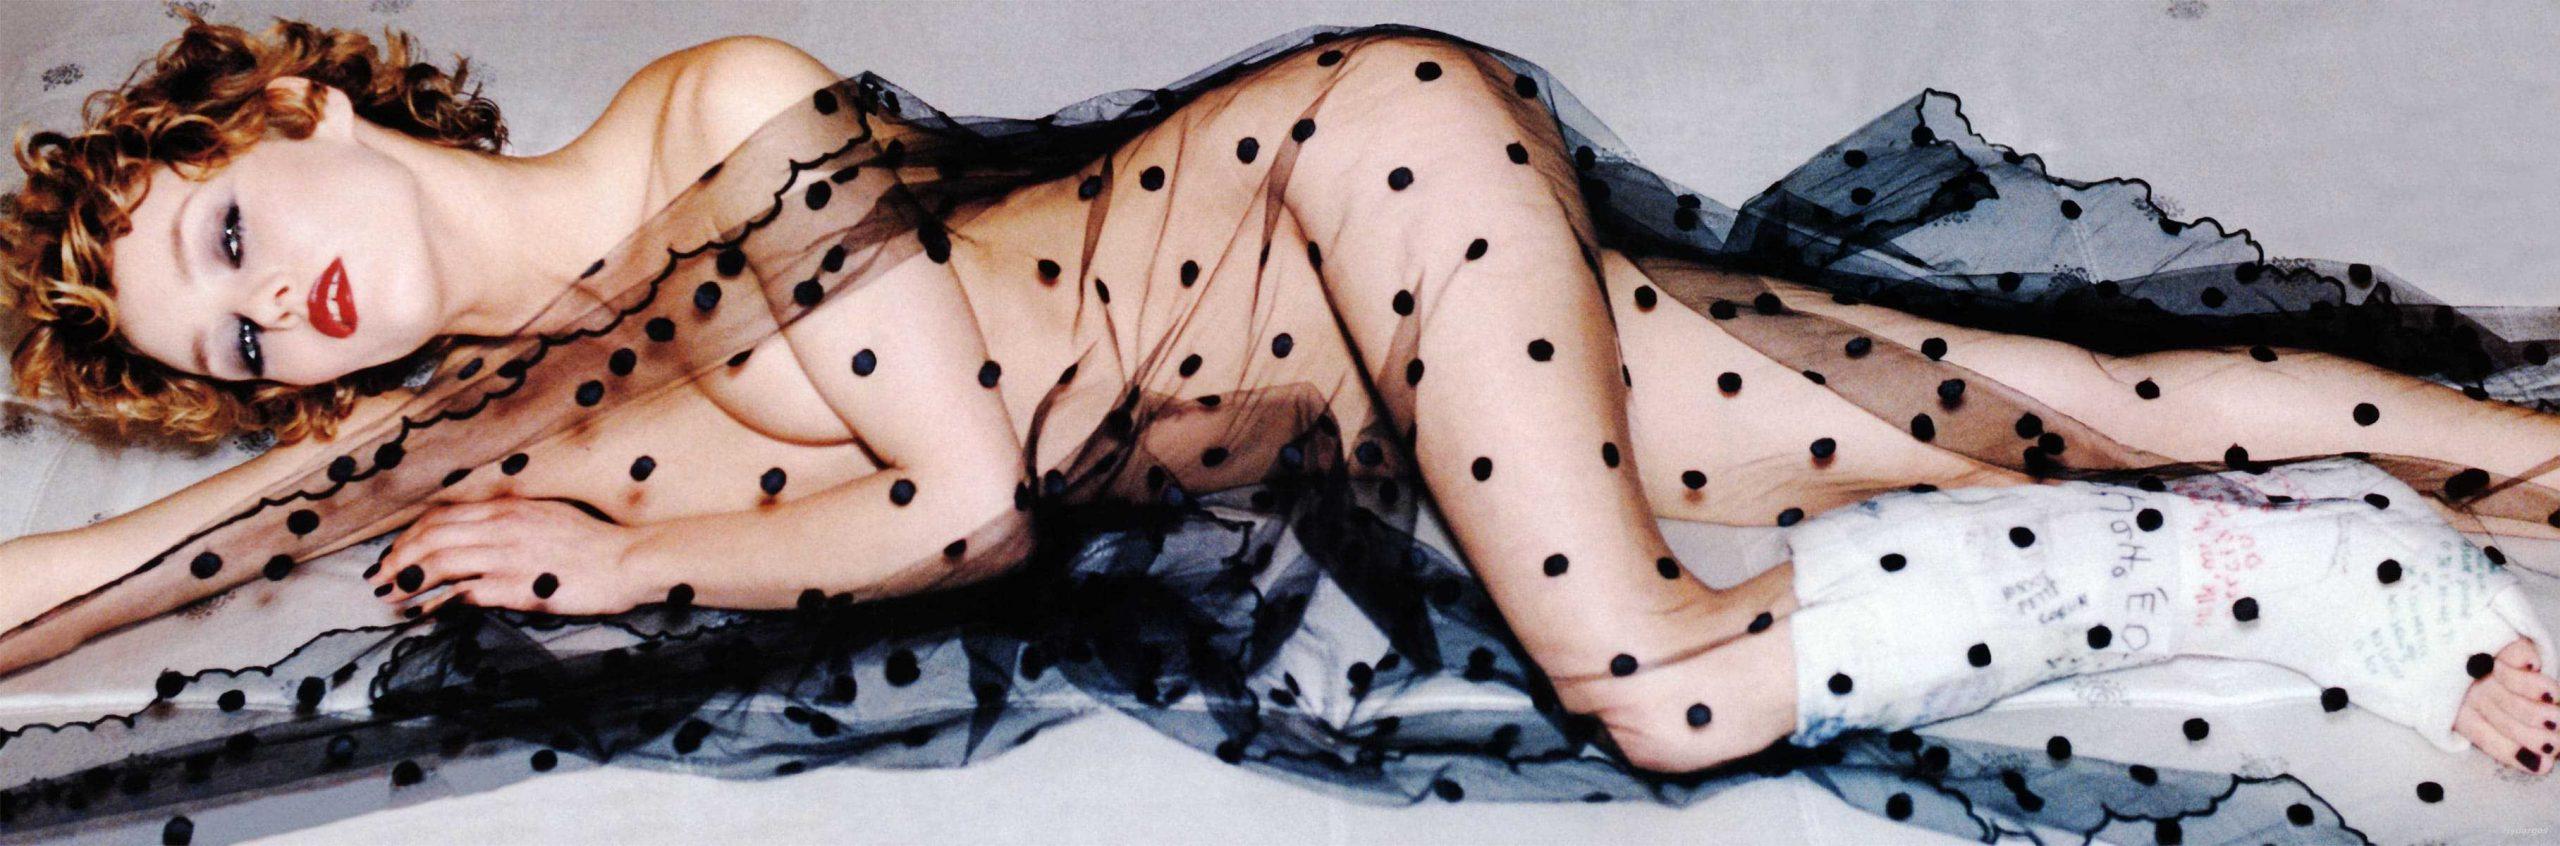 Vanessa Paradis cleavage